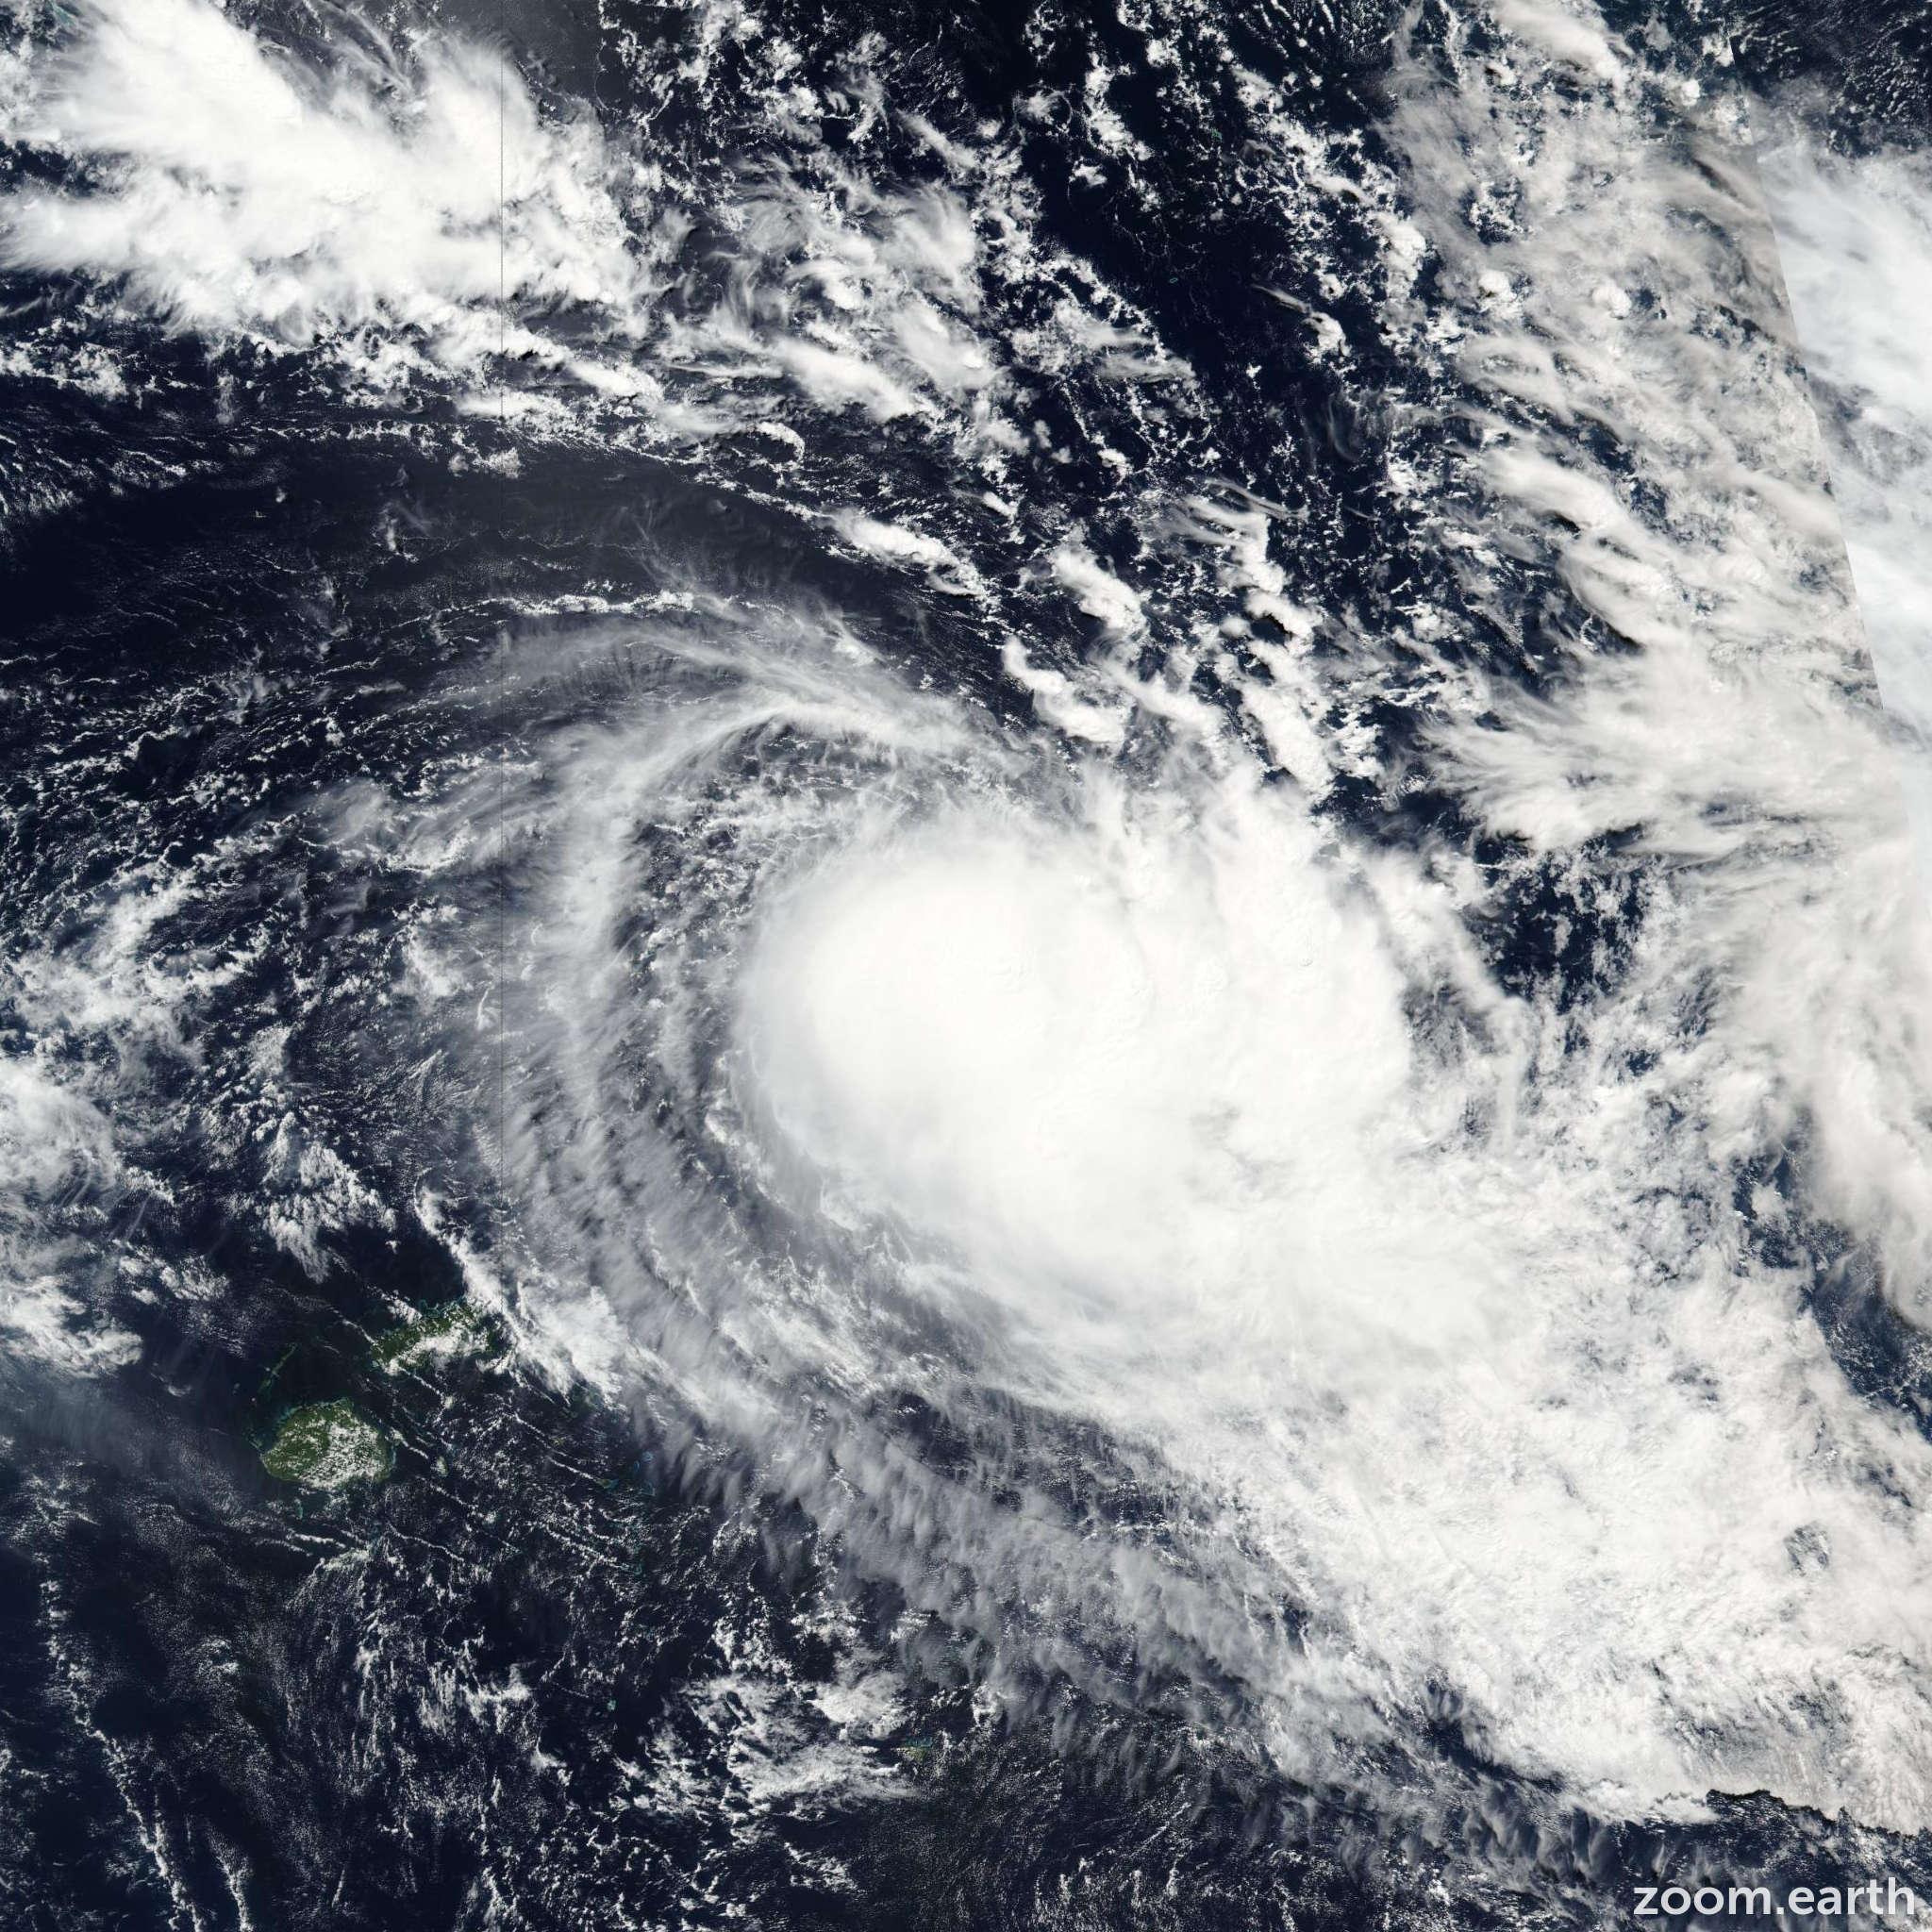 Satellite image of Cyclone Amos 2016